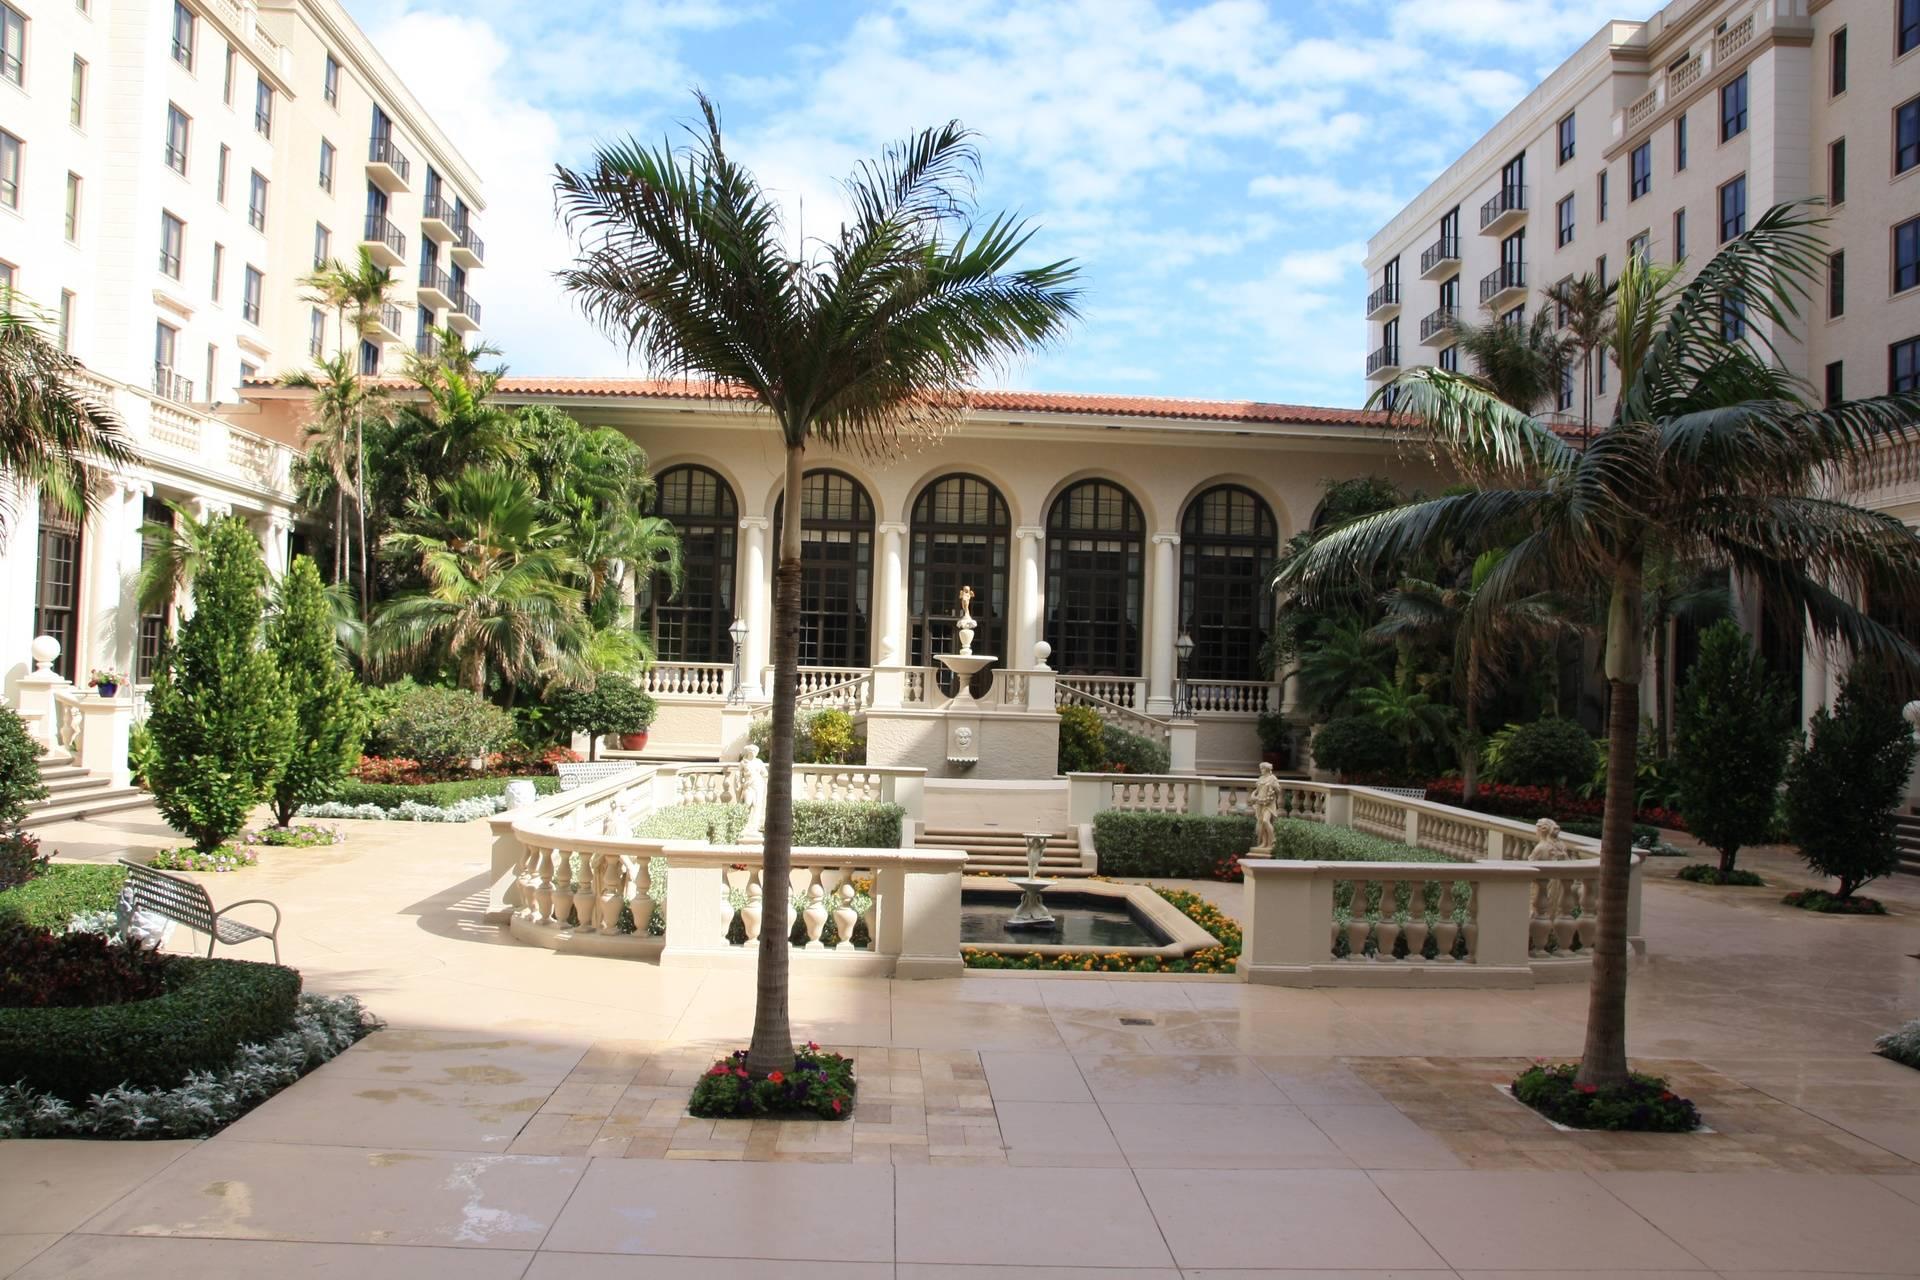 Breakers Hotel, Palm Beach FL